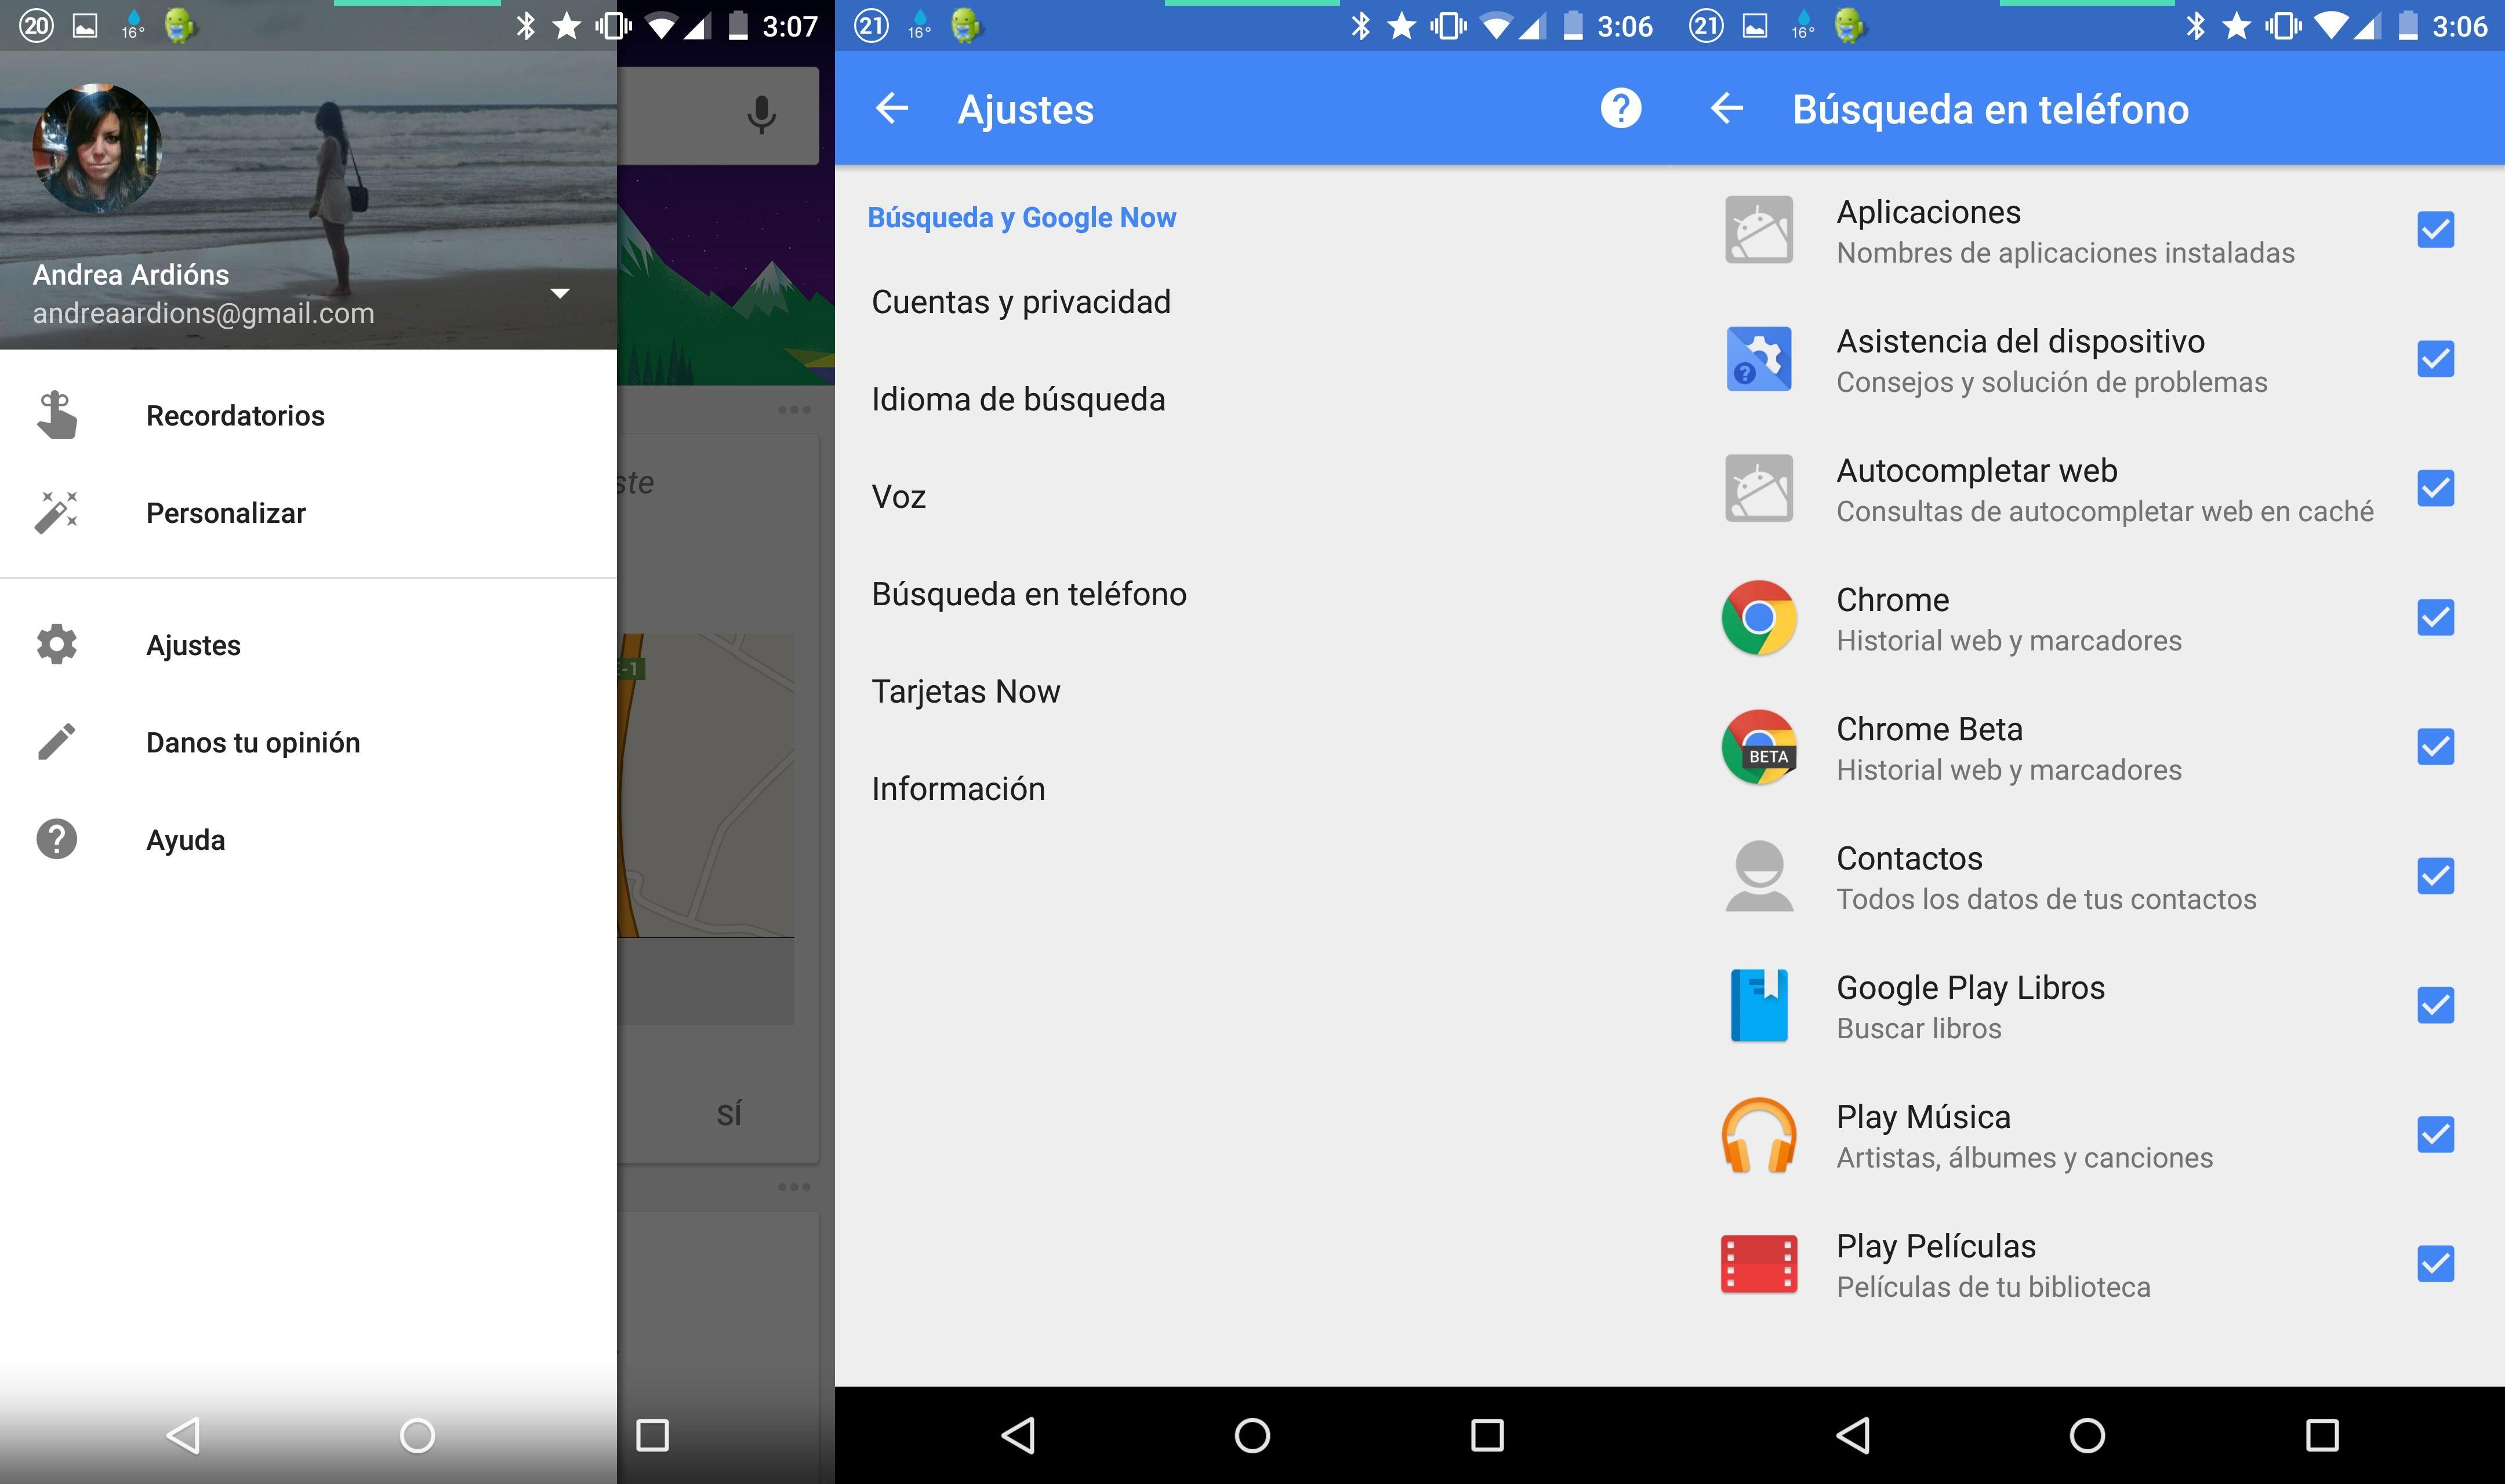 Ocultar tarjetas de búsquedas en Google Now